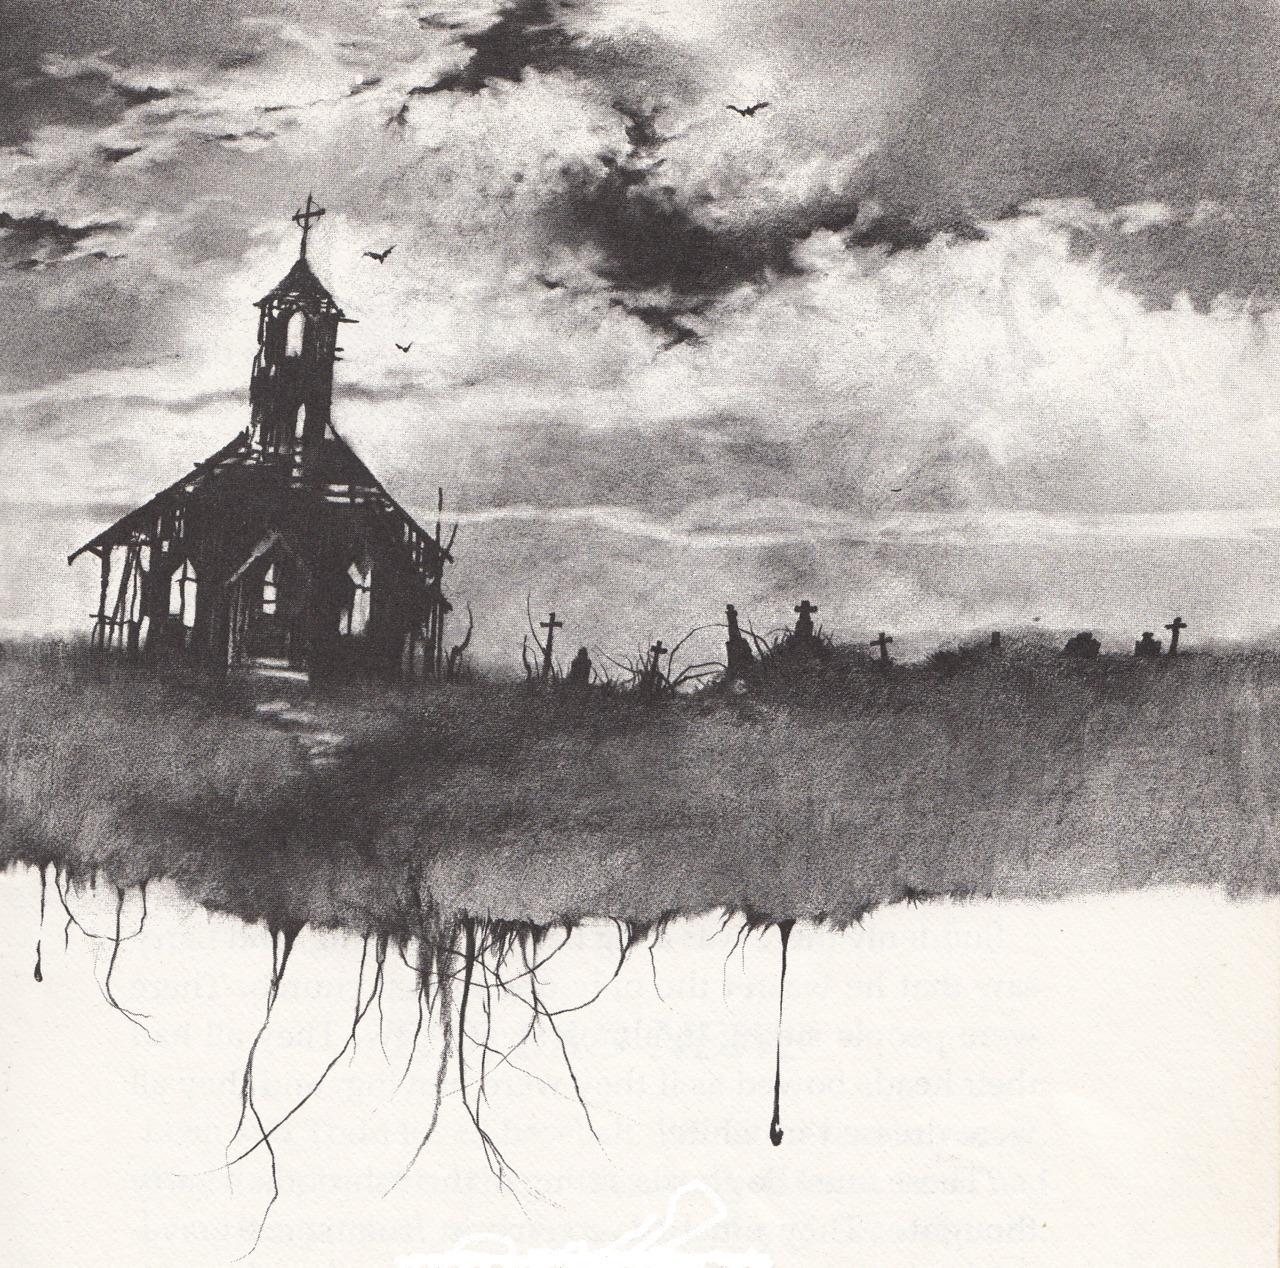 Images of Creepy Graveyard Music - #rock-cafe